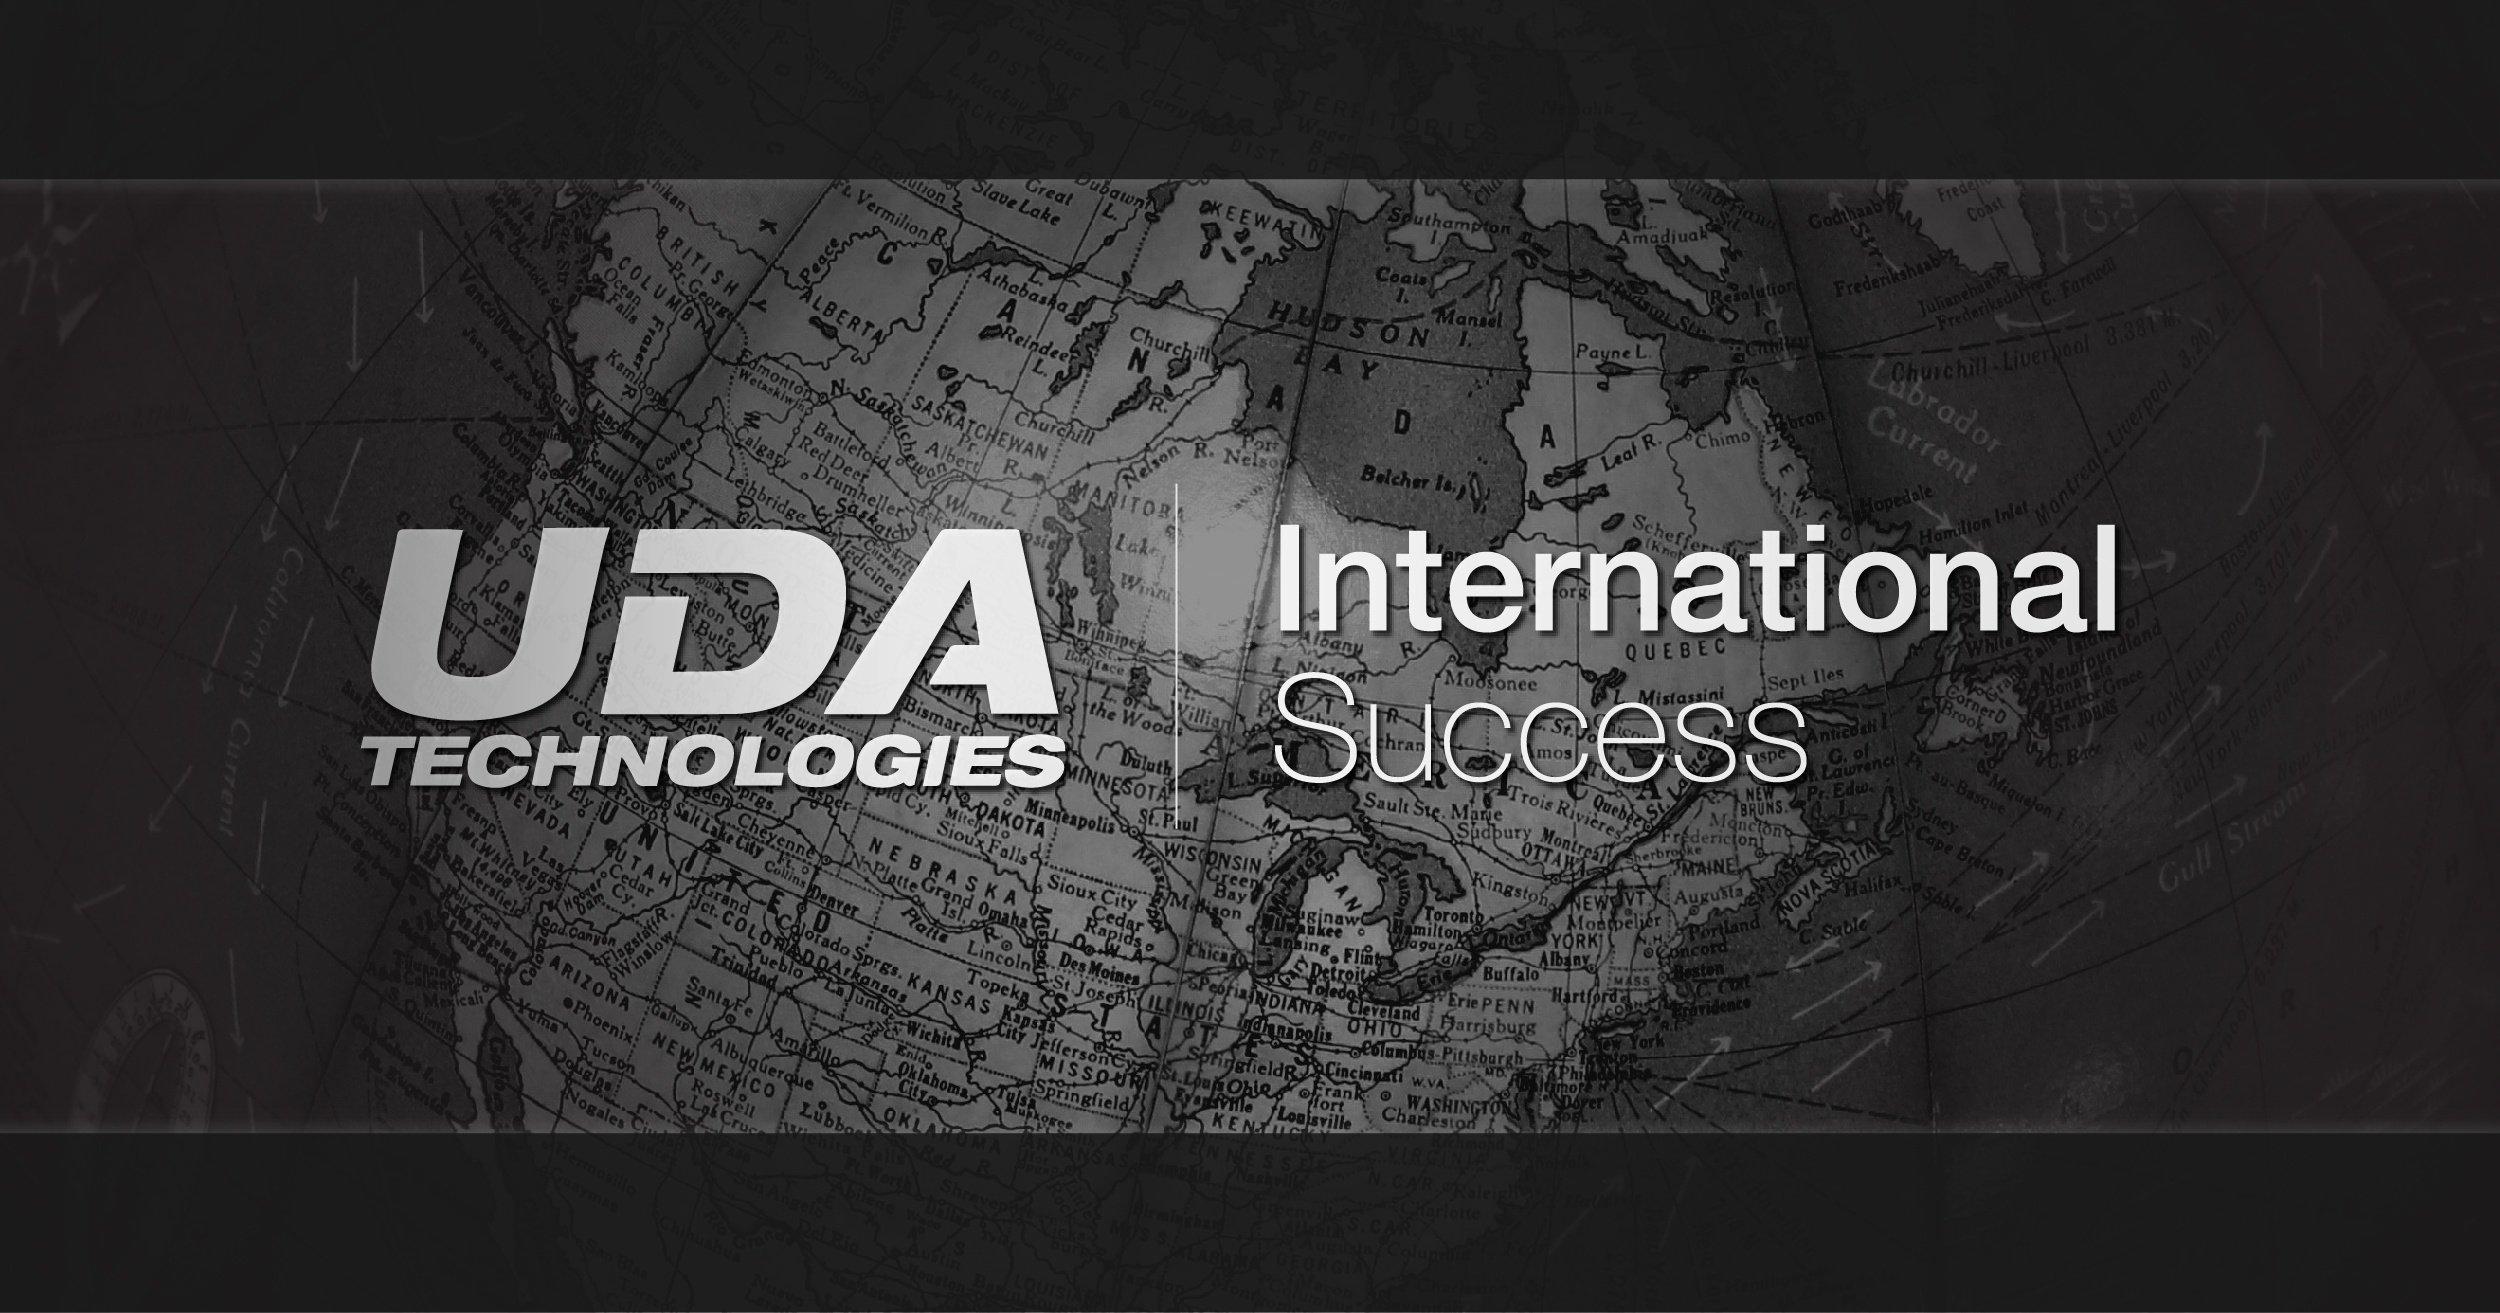 UDA Technologies Experiences Impressive International Success